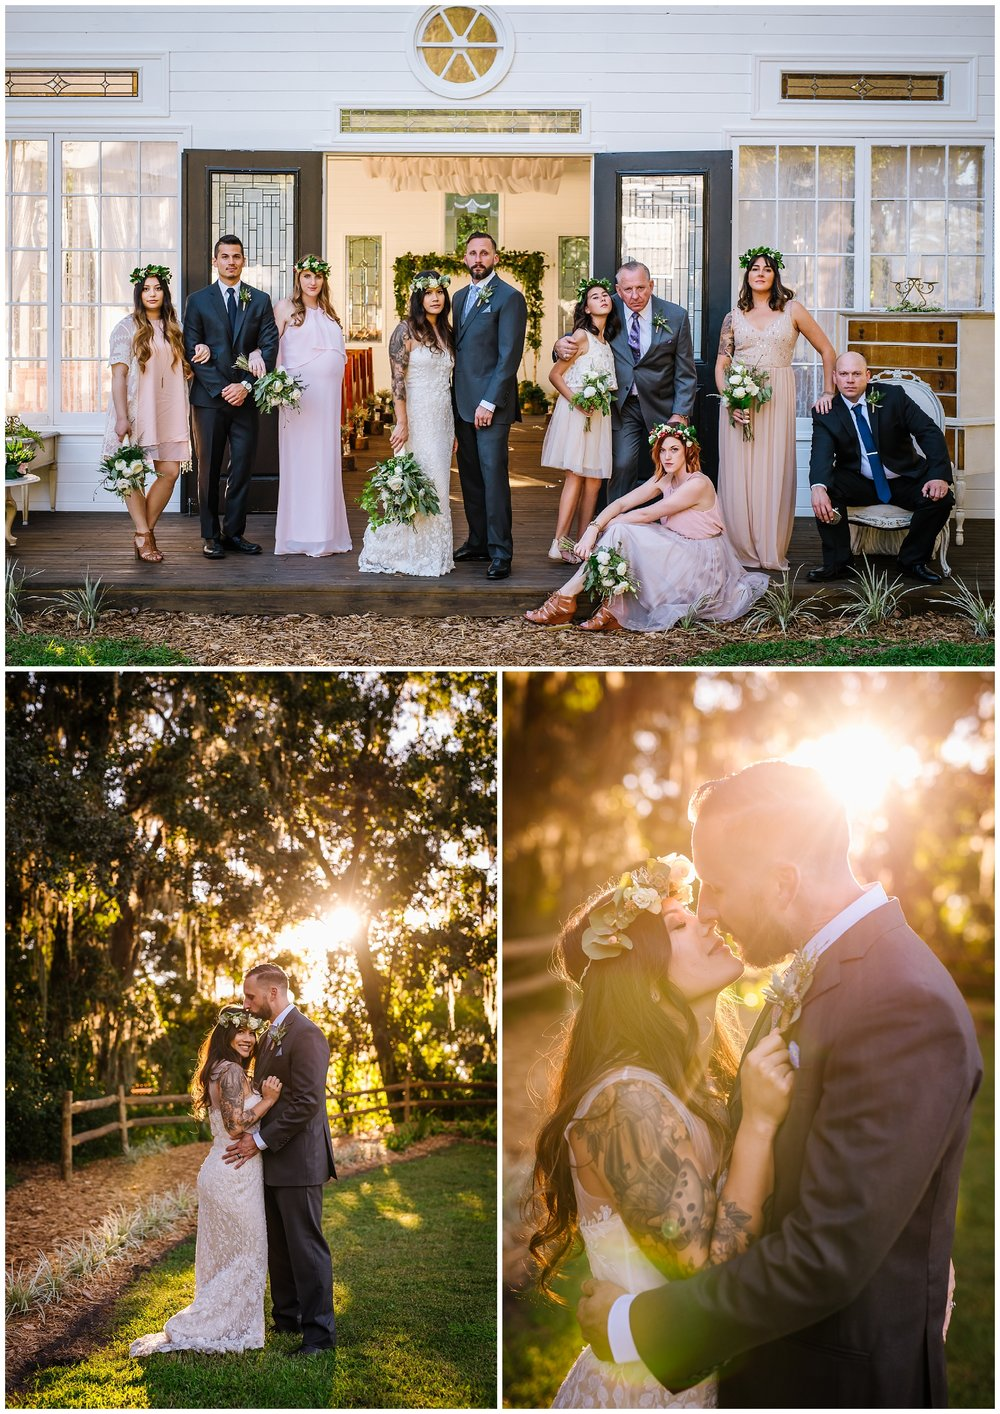 Ashlee-hamon-photography-year-in-review-2016-travel-wanderlust-vsco-adventure-wedding_0101.jpg